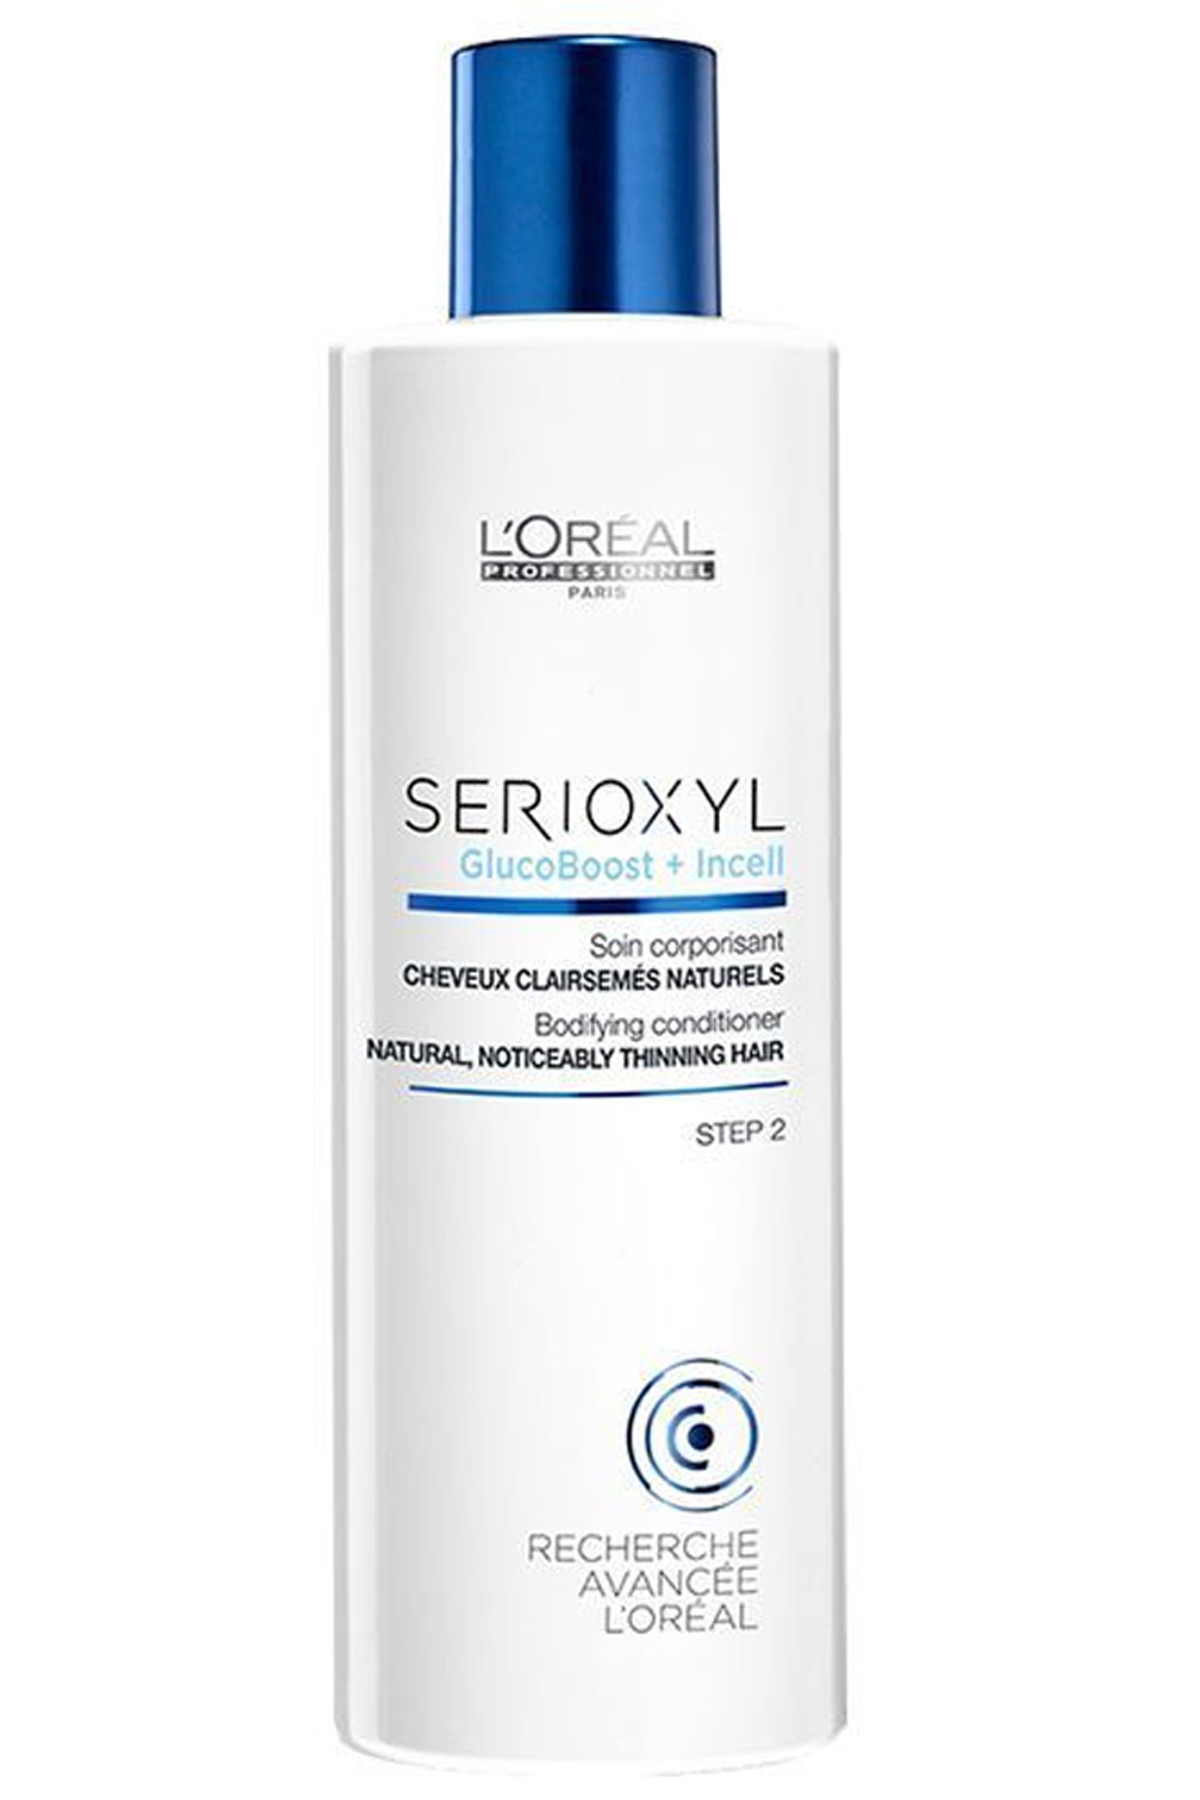 L'oreal Professionnel Serioxyl GlucoBoost+Incell Conditioner - Dolgunlaştırıcı Saç Kremi 250 ml  3474630643253 1